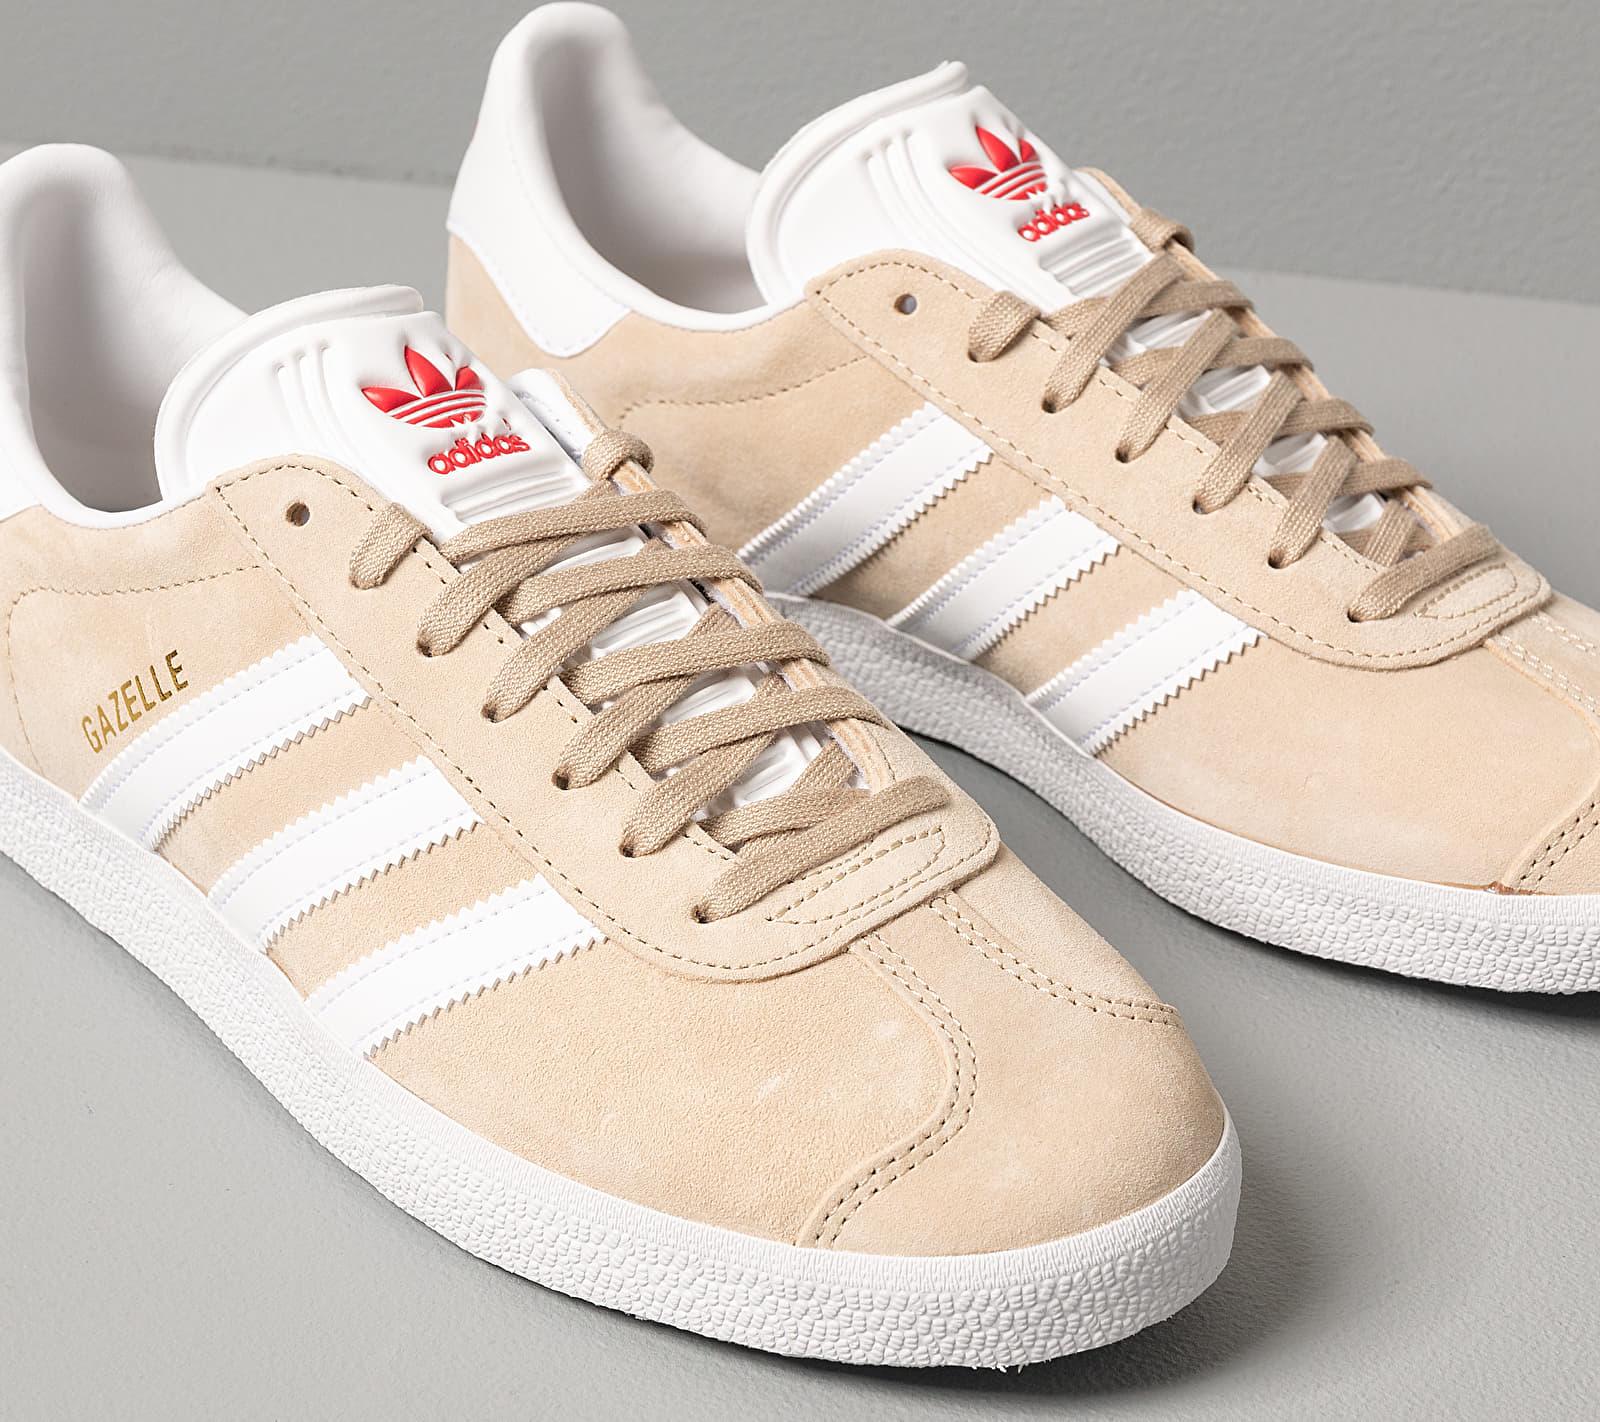 adidas Gazelle W Savanna/ Ftw White/ Glow Red EUR 36